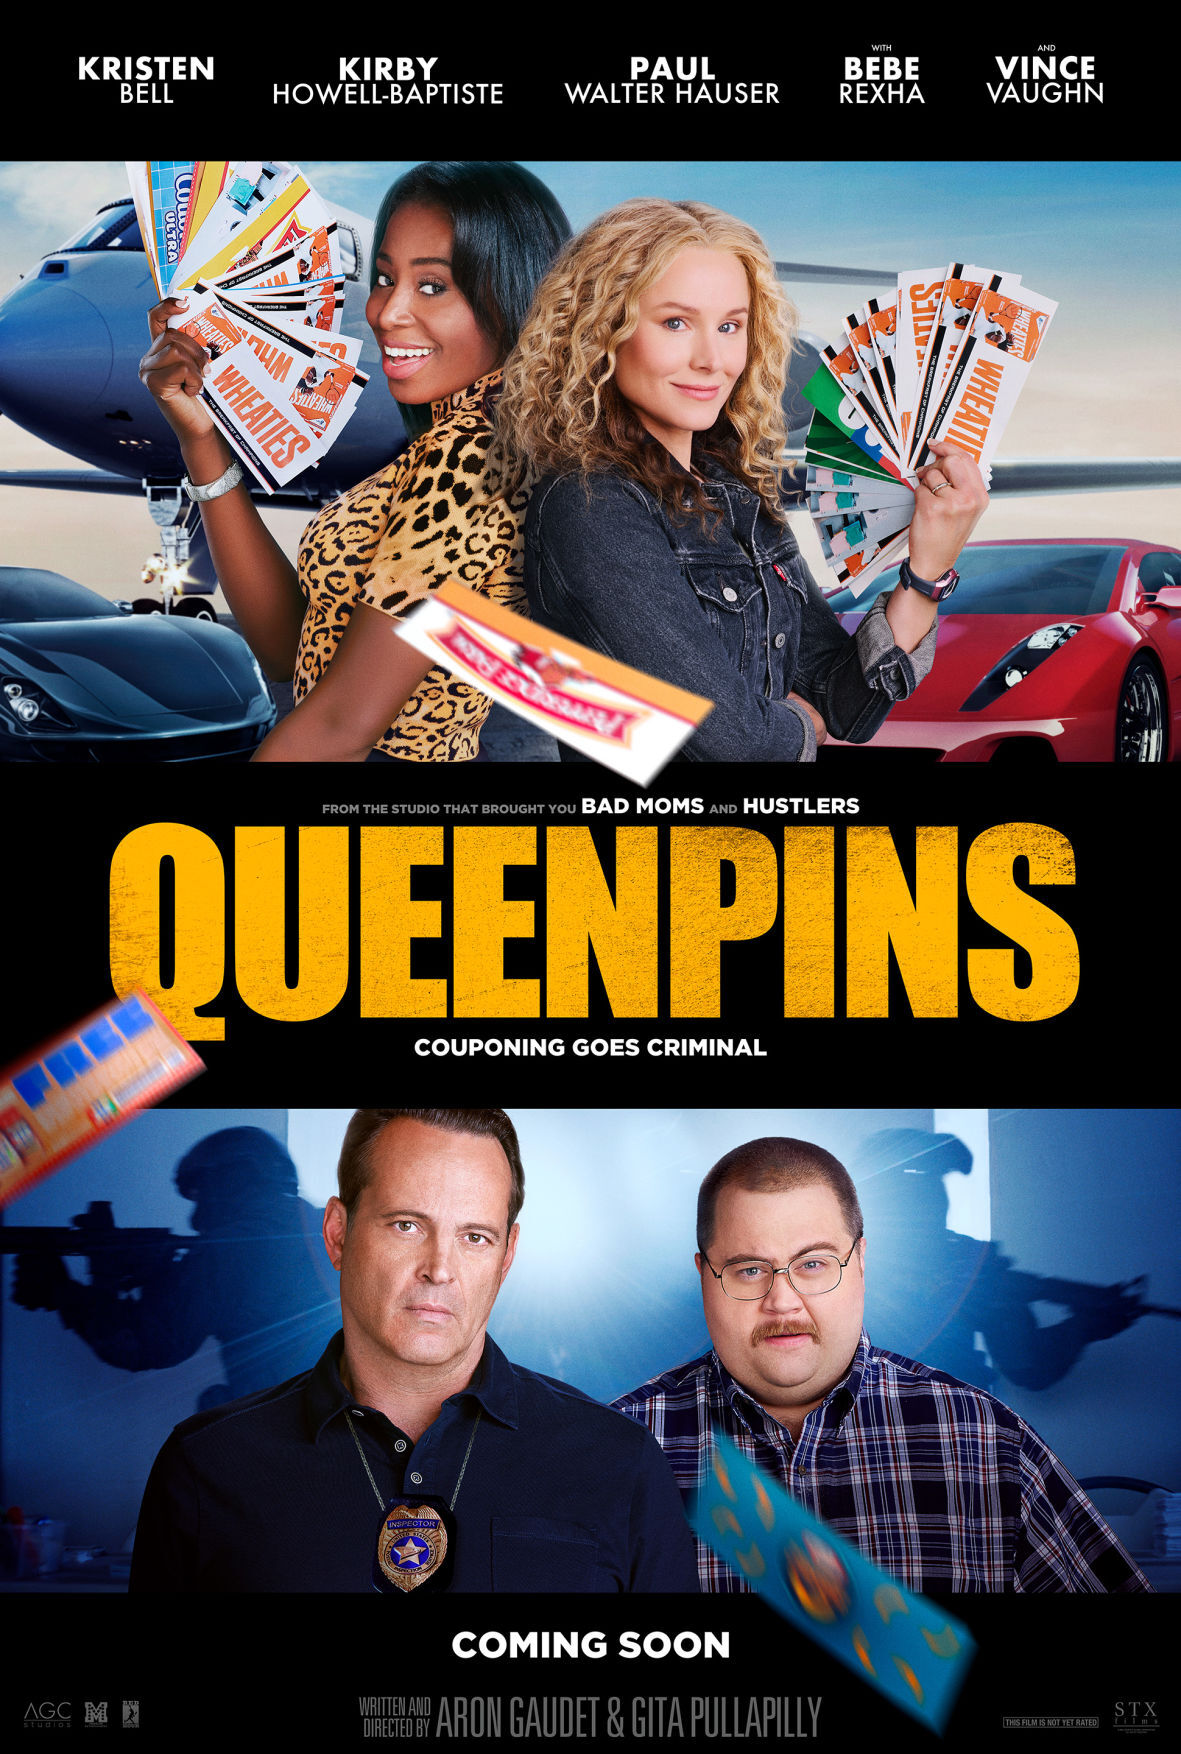 queenpins movie poster